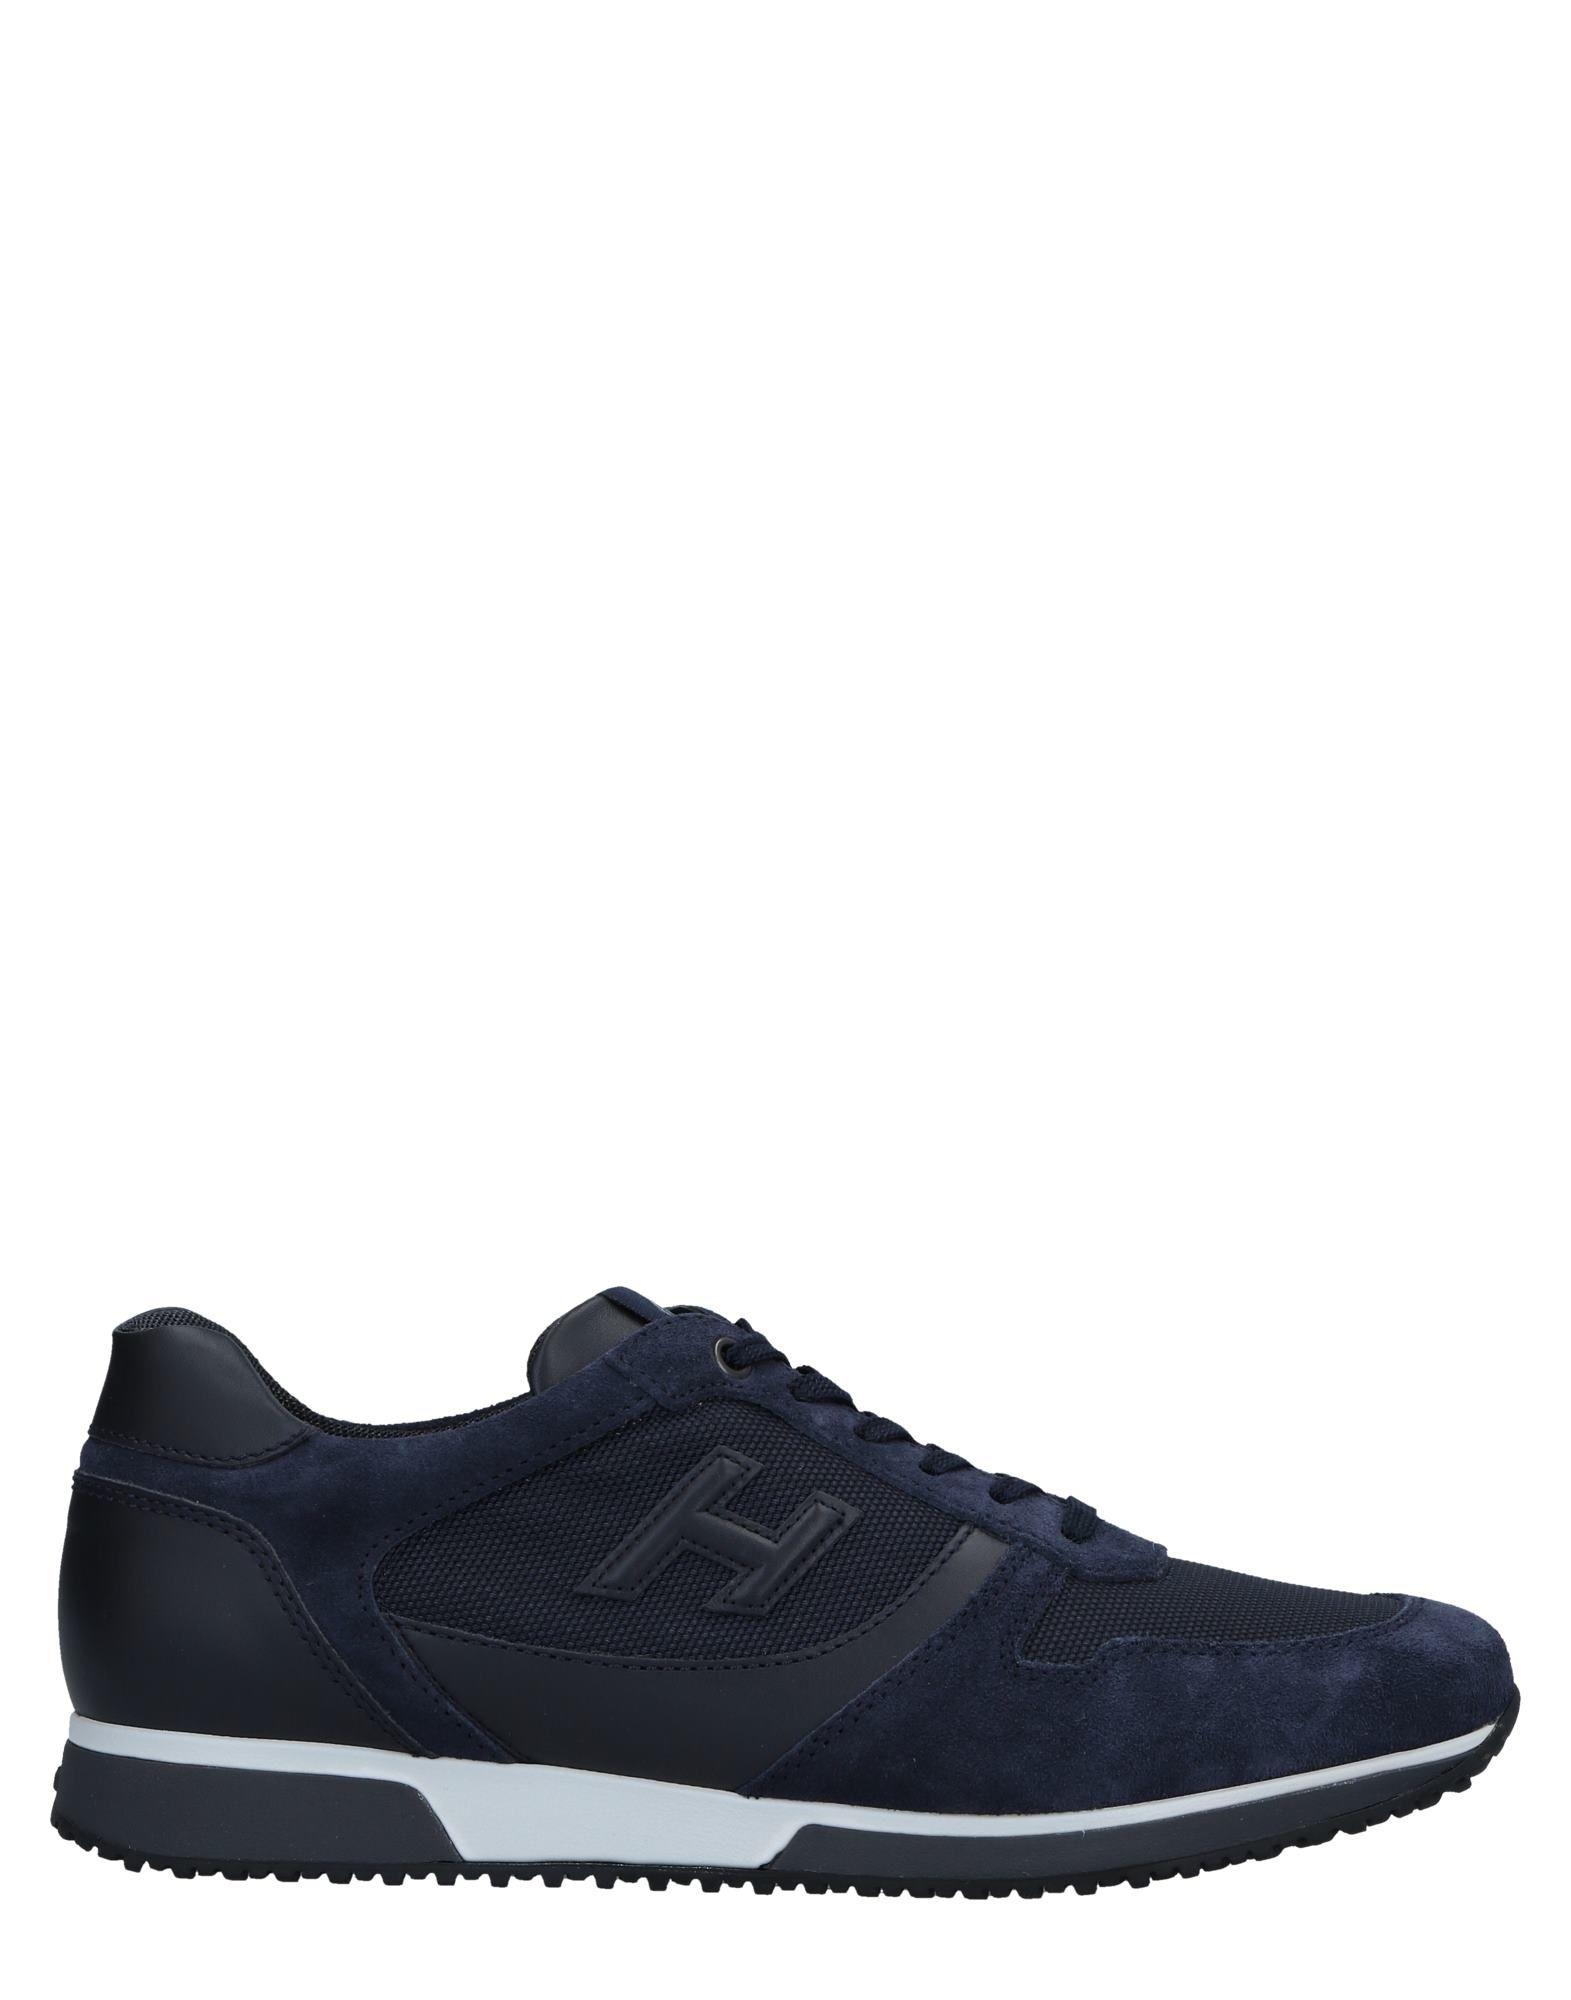 Moda Sneakers Hogan Uomo - 11517069PF